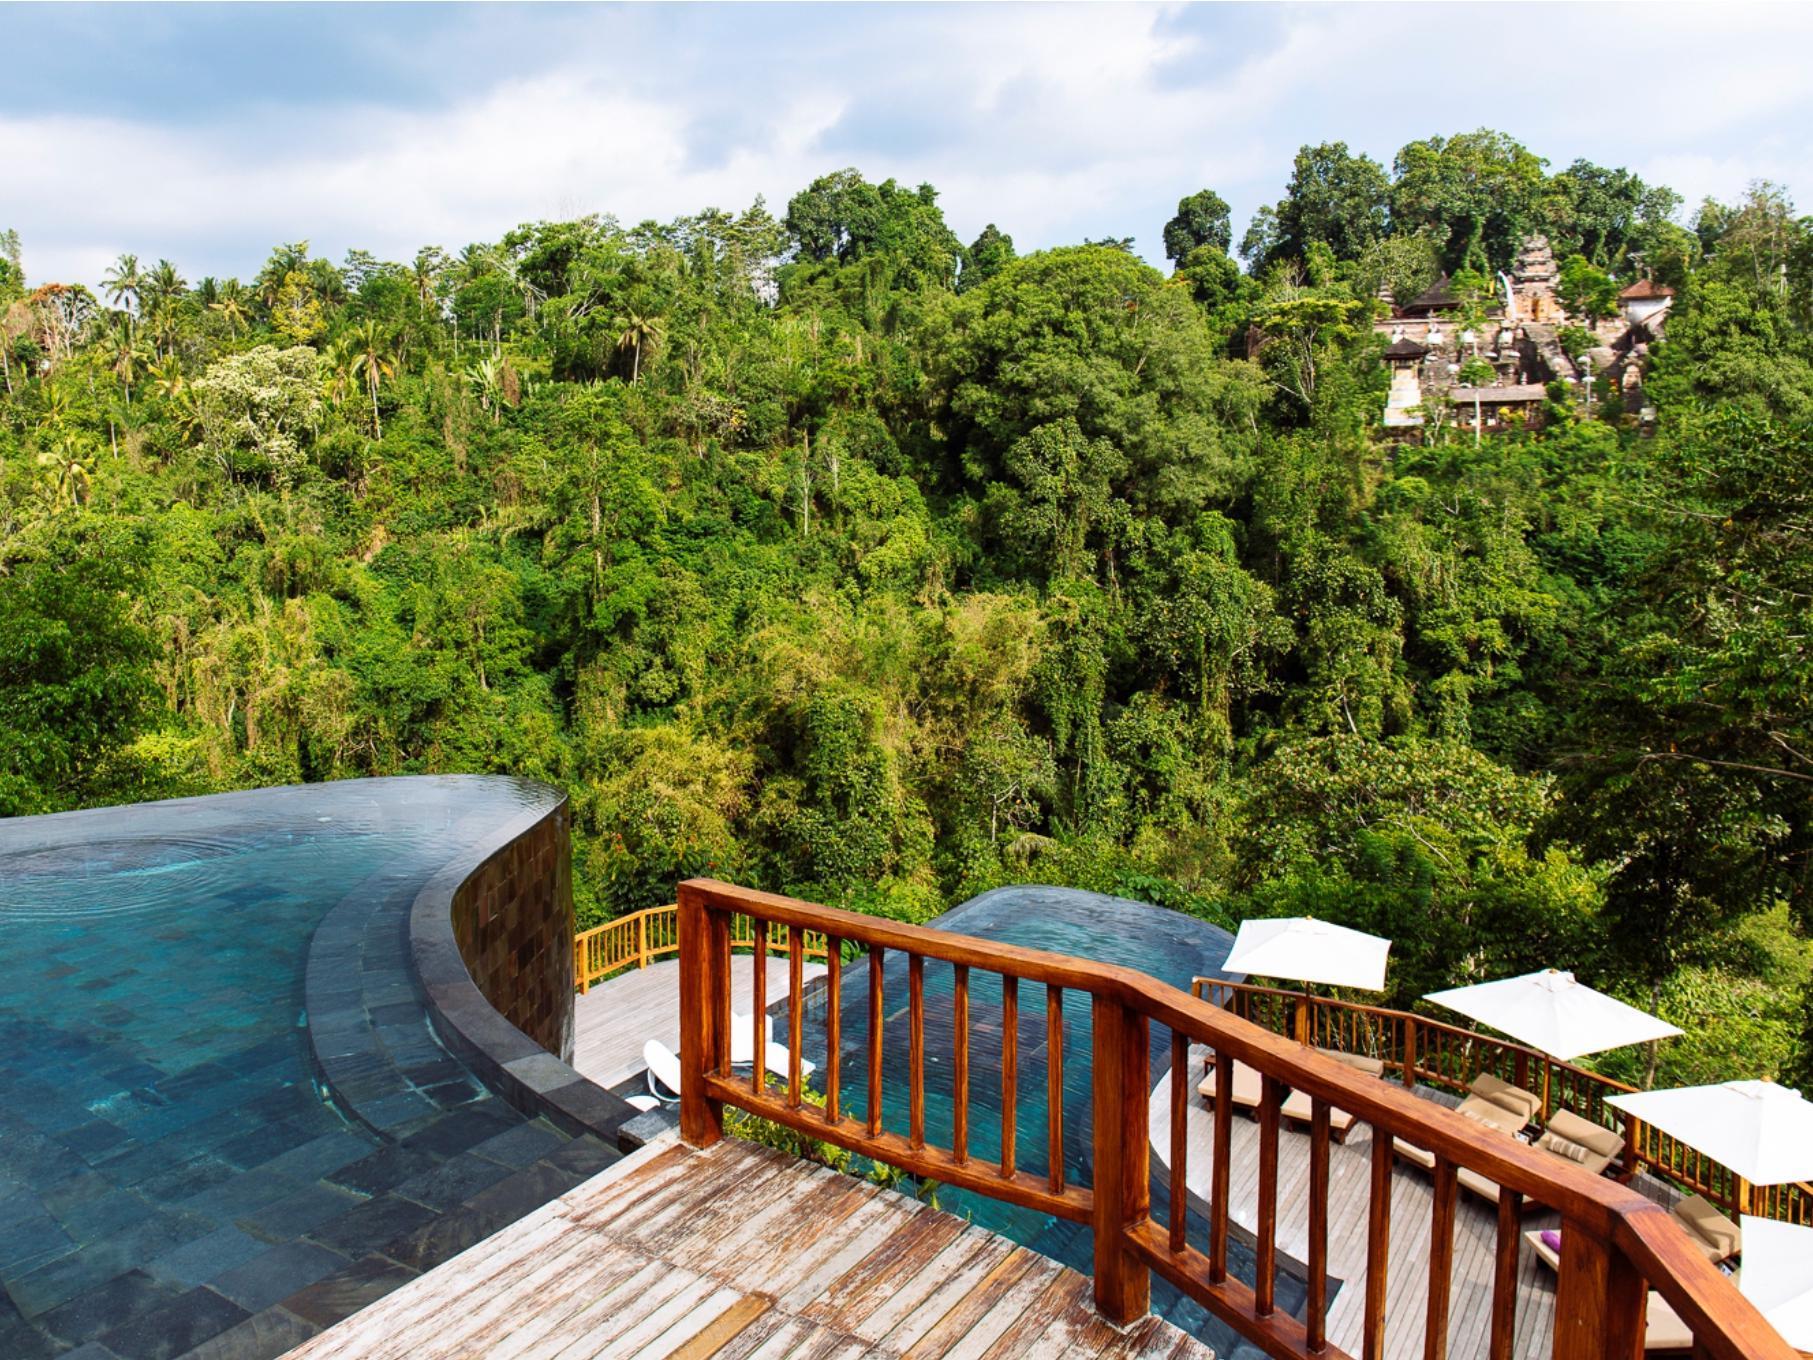 Hanging Garden Of Bali17